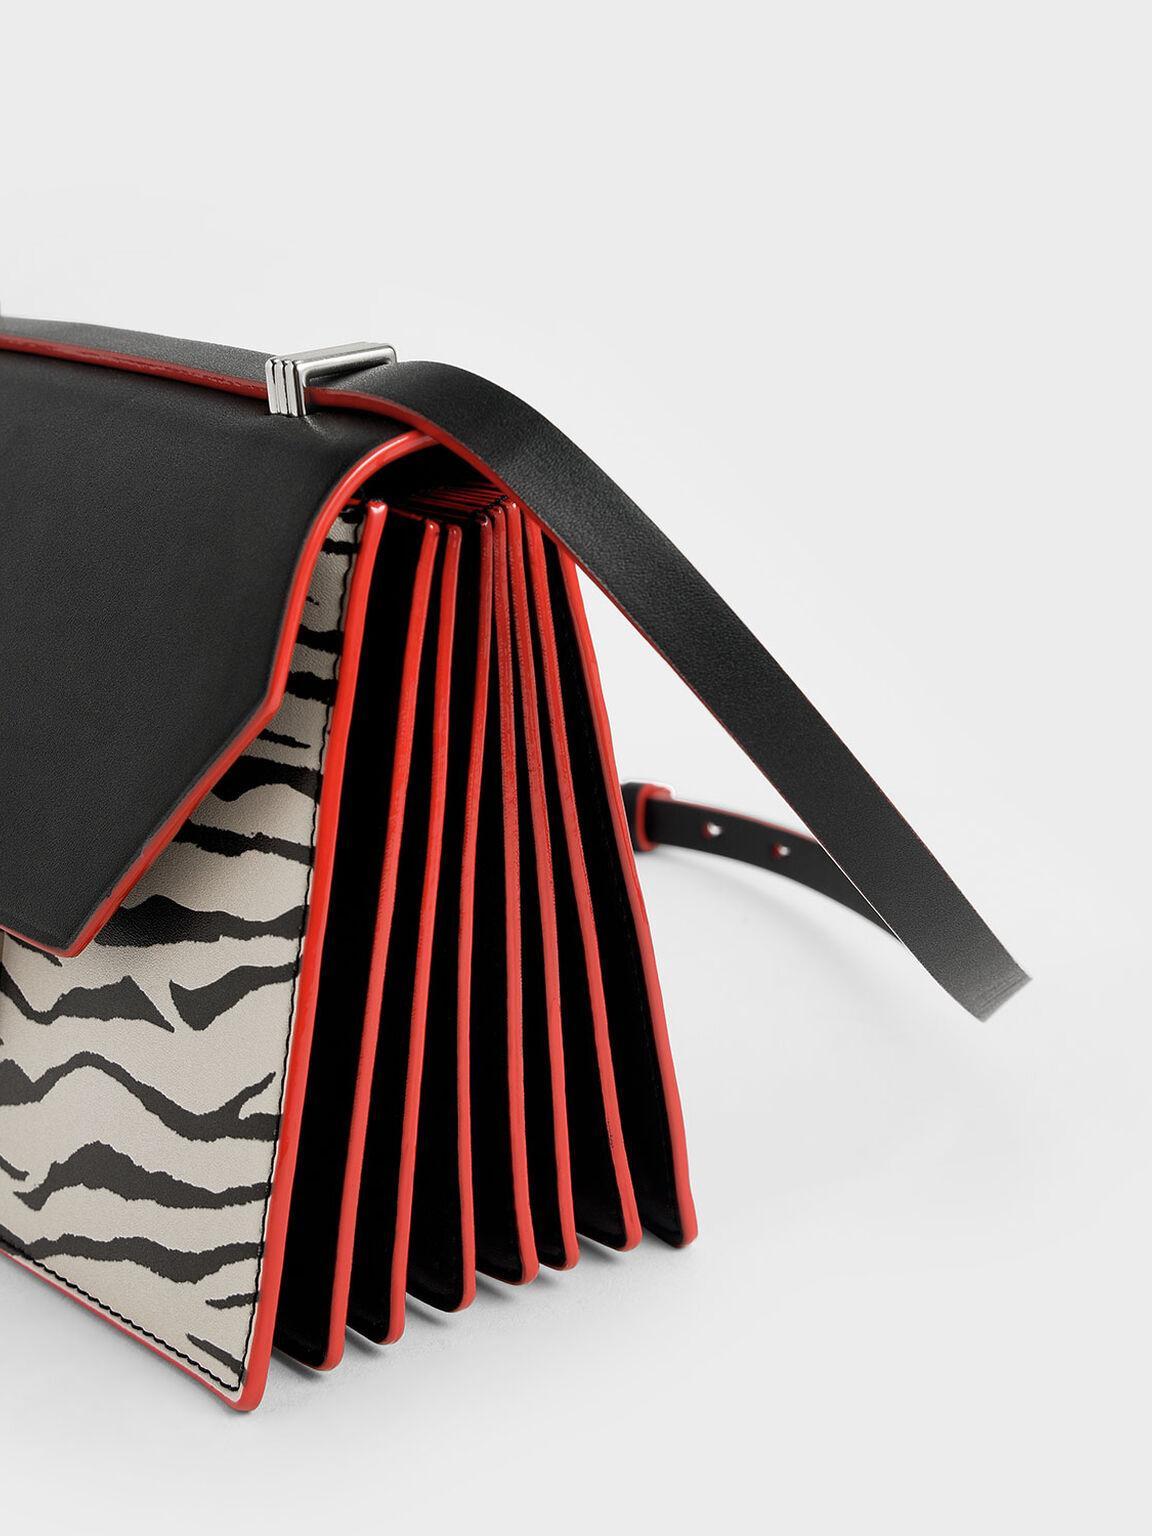 Velvet White Tiger Print Metal Accent Crossbody Bag, Multi, hi-res